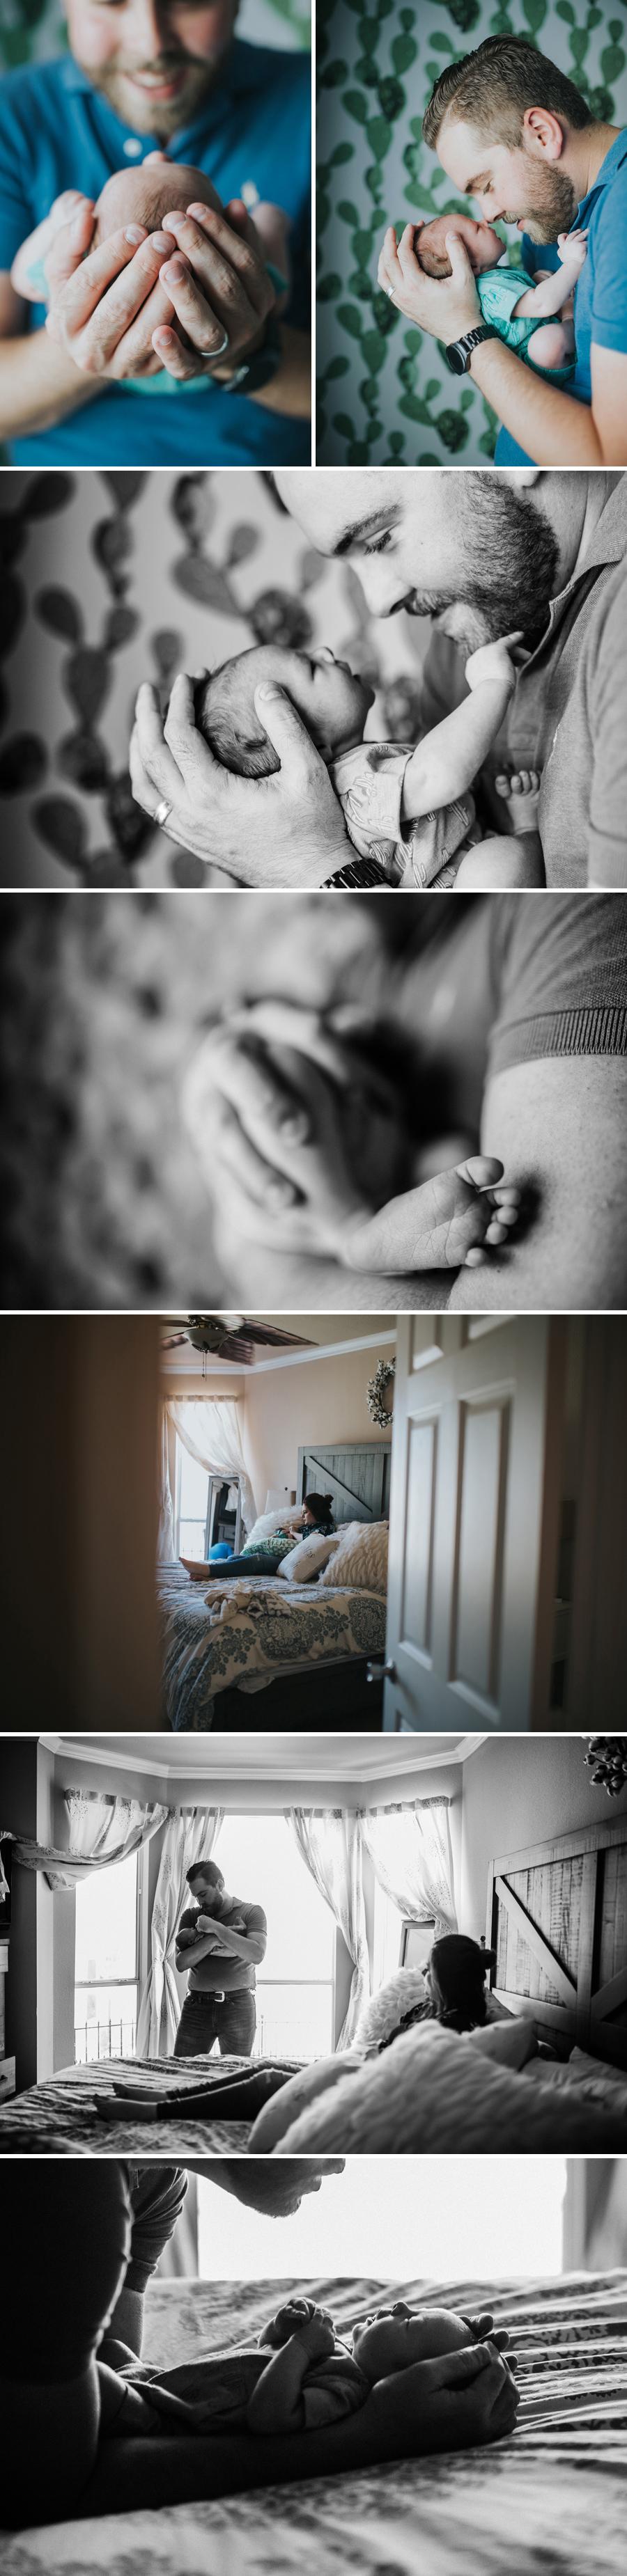 Connecticut-Newborn-Photographercomp005.jpg